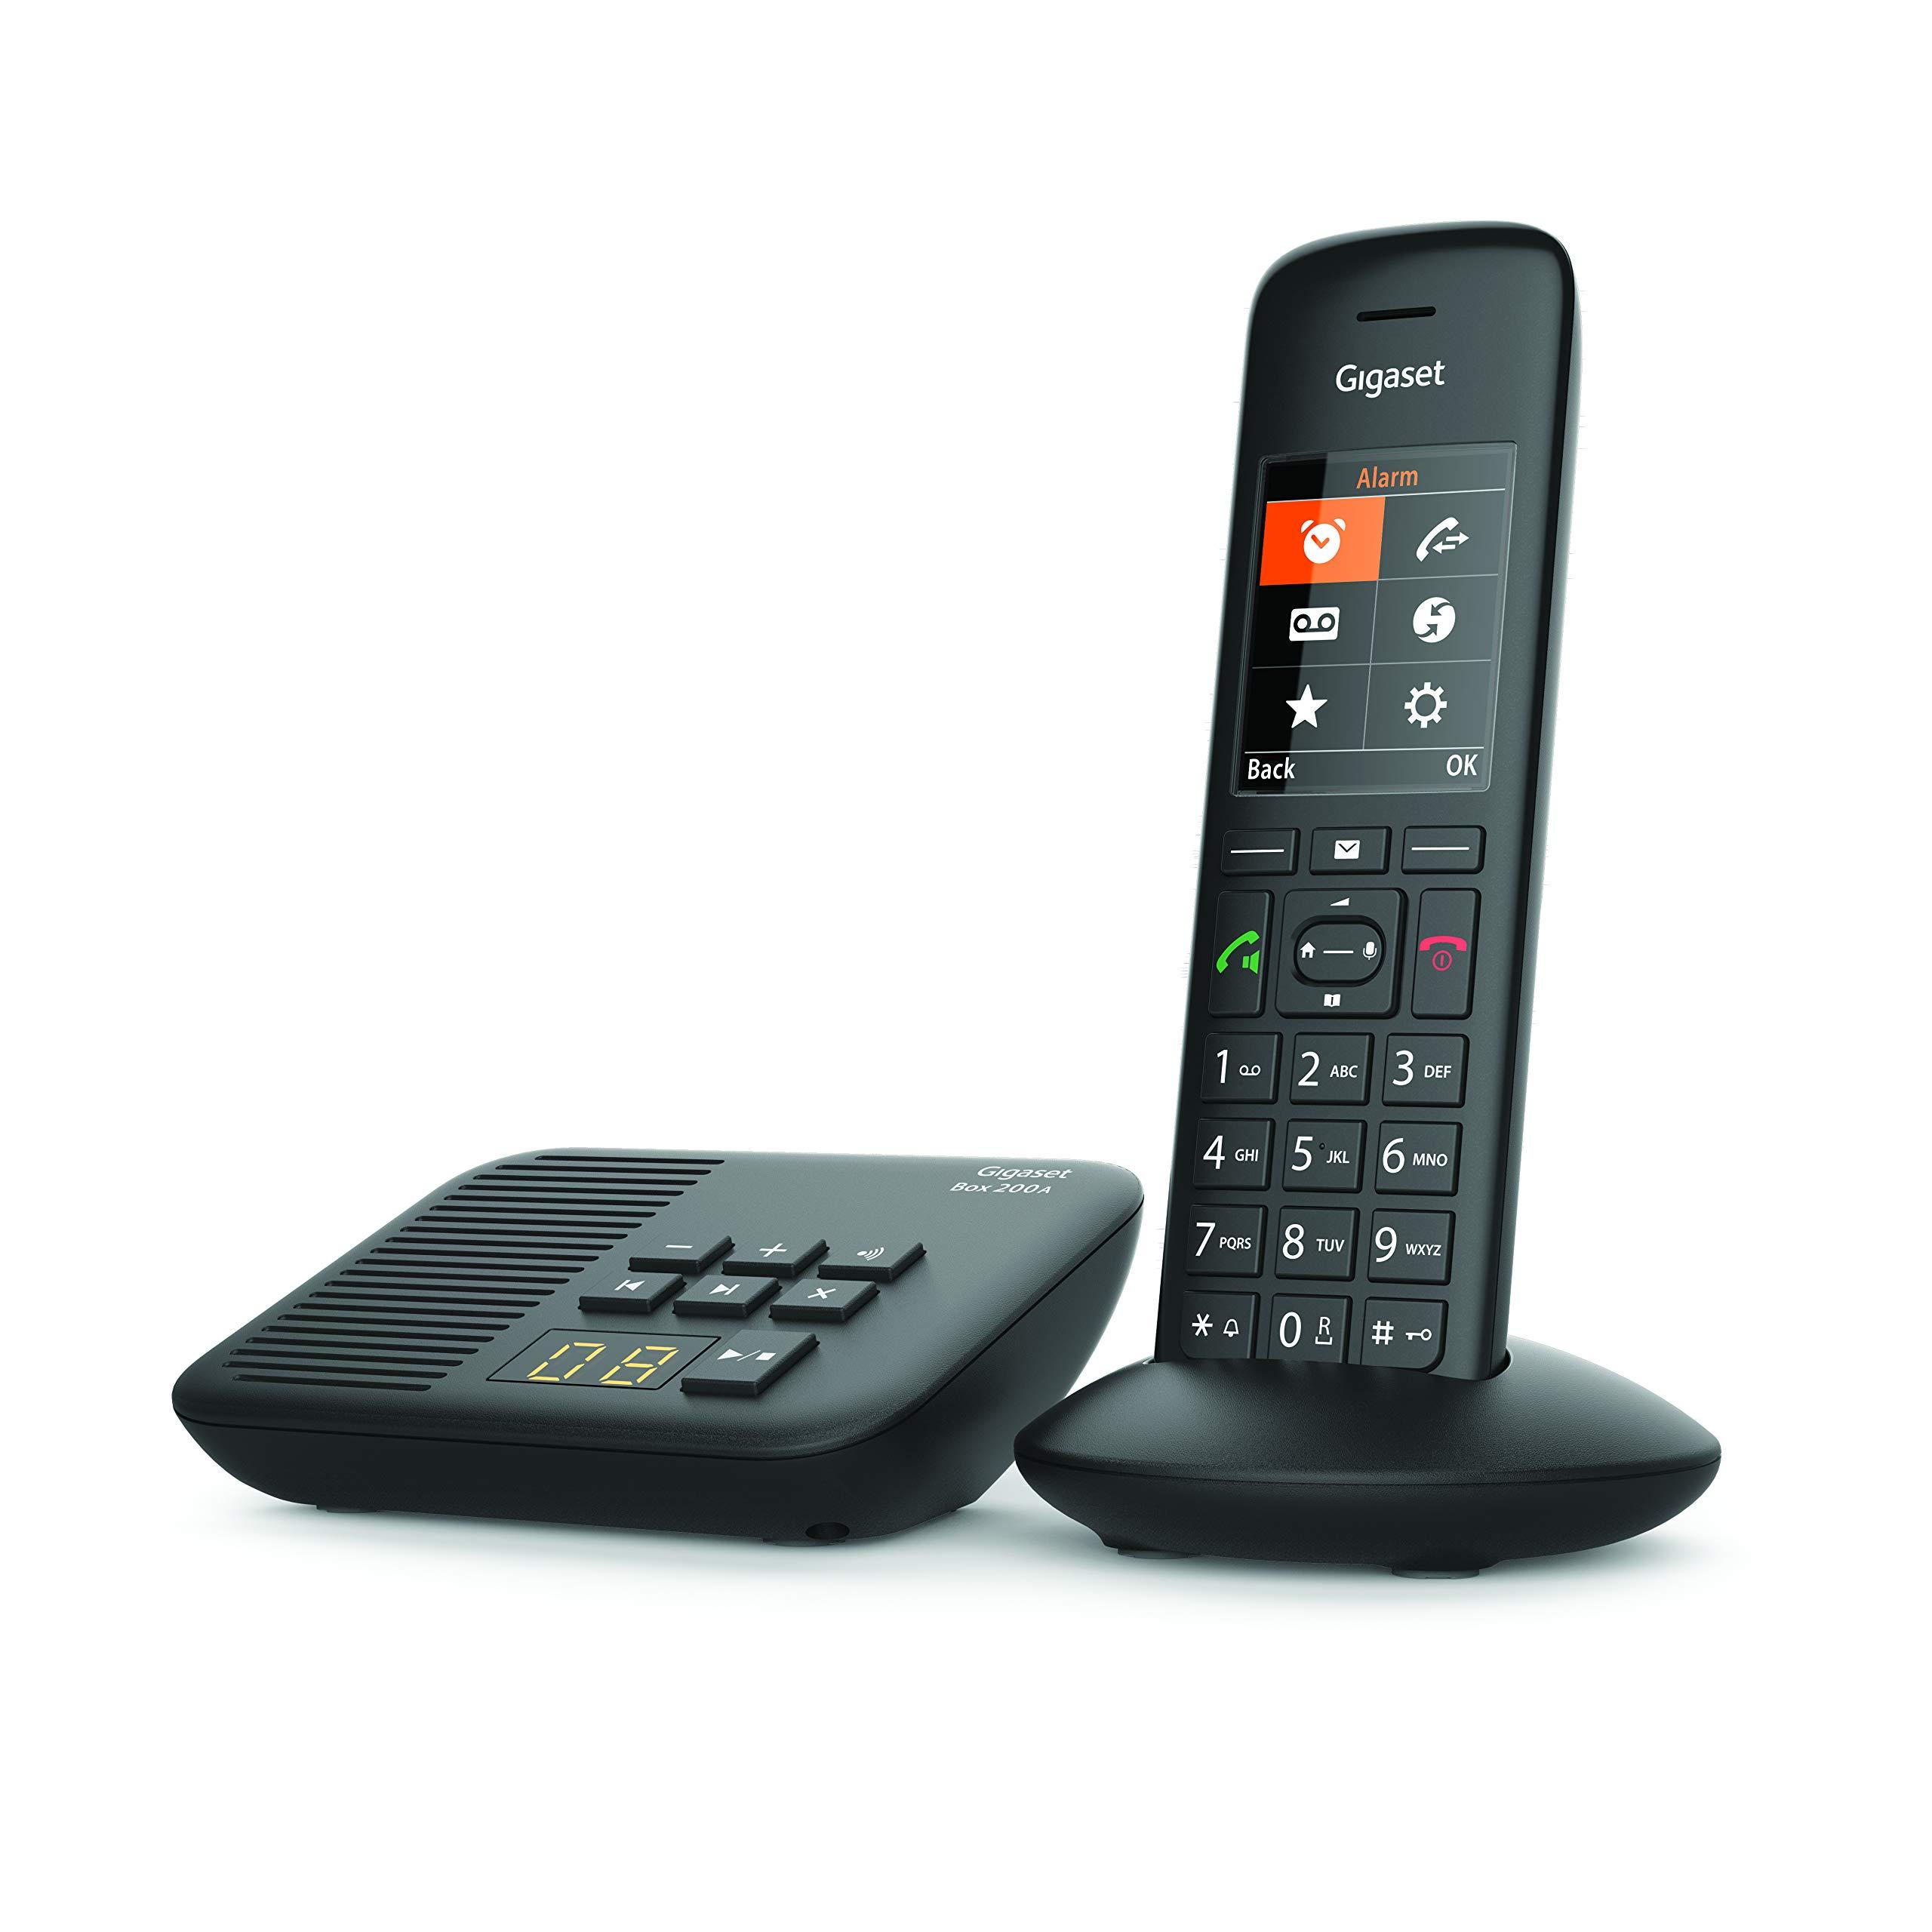 Gigaset C570A Solo - Teléfono (Teléfono DECT, Terminal inalámbrico, Altavoz, 200 entradas, Identificador de Llamadas, con Contestador, Negro): Amazon.es: Electrónica